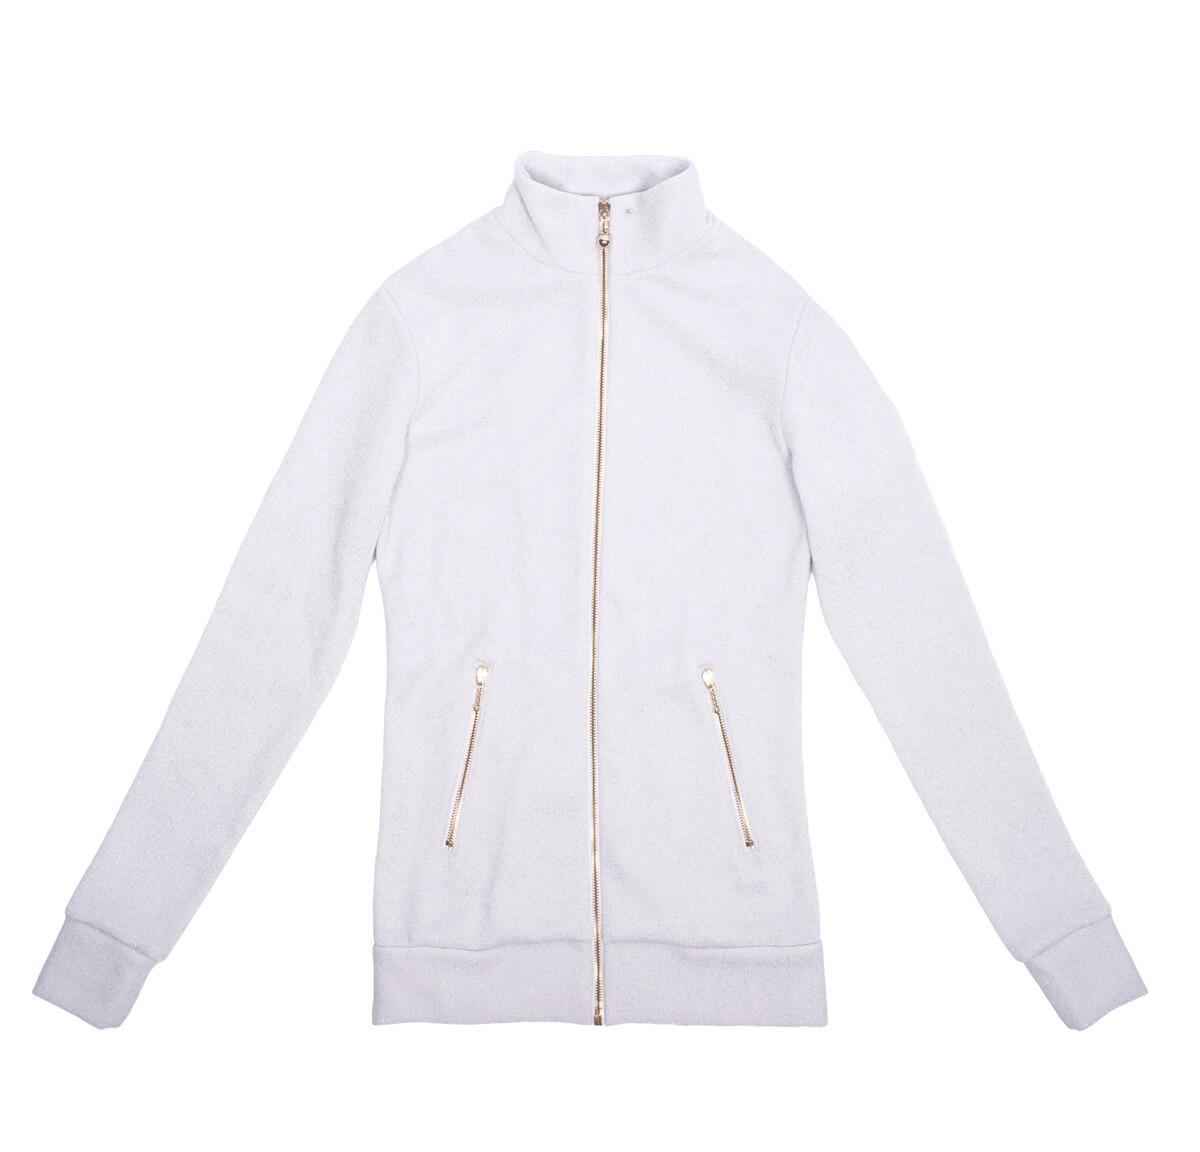 BRIGHT WHITE (Jacket)